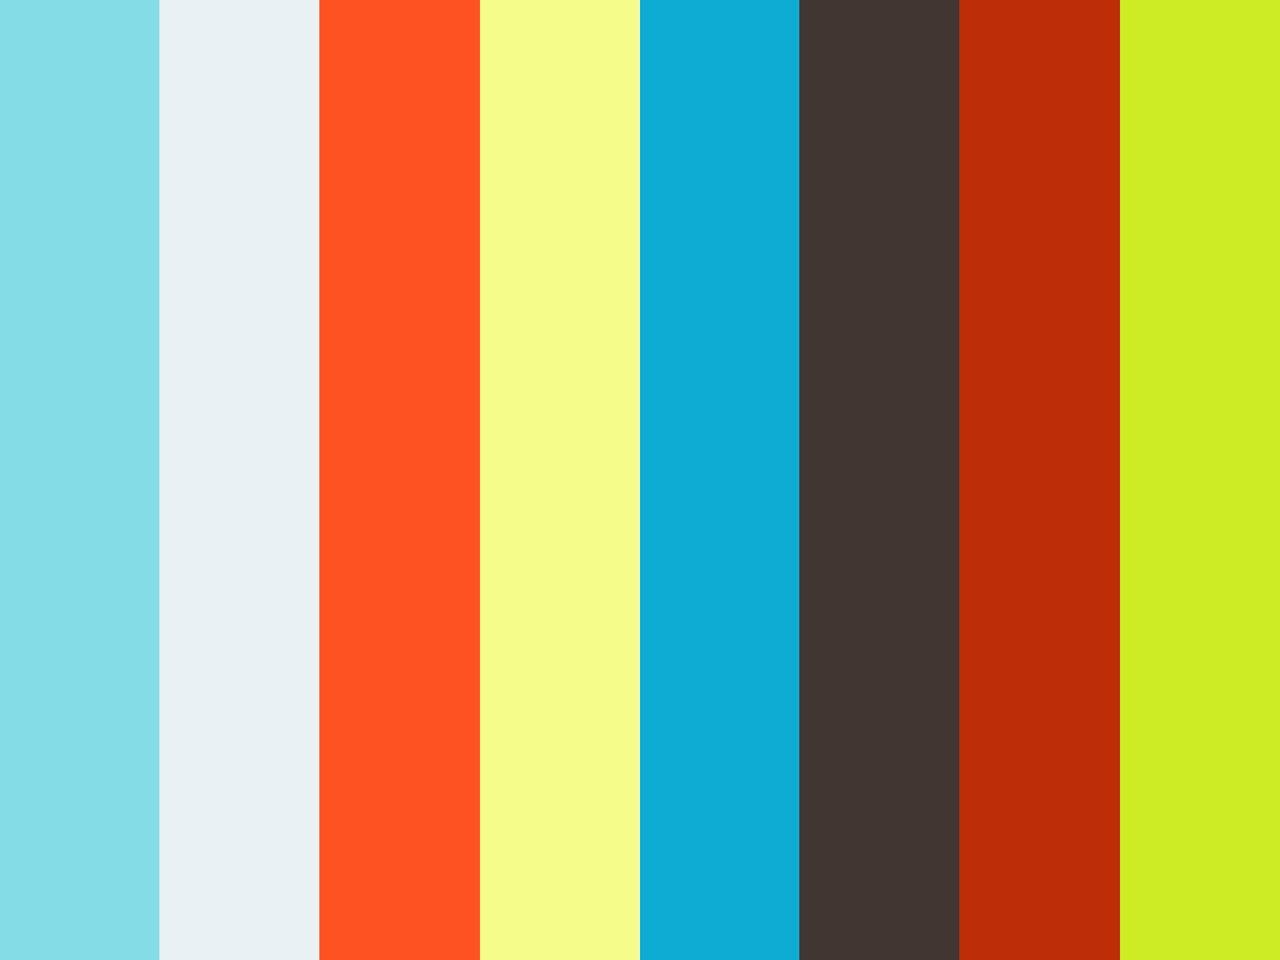 113 Branding Red Carpet TV Web Series Featuring Heather Poduska